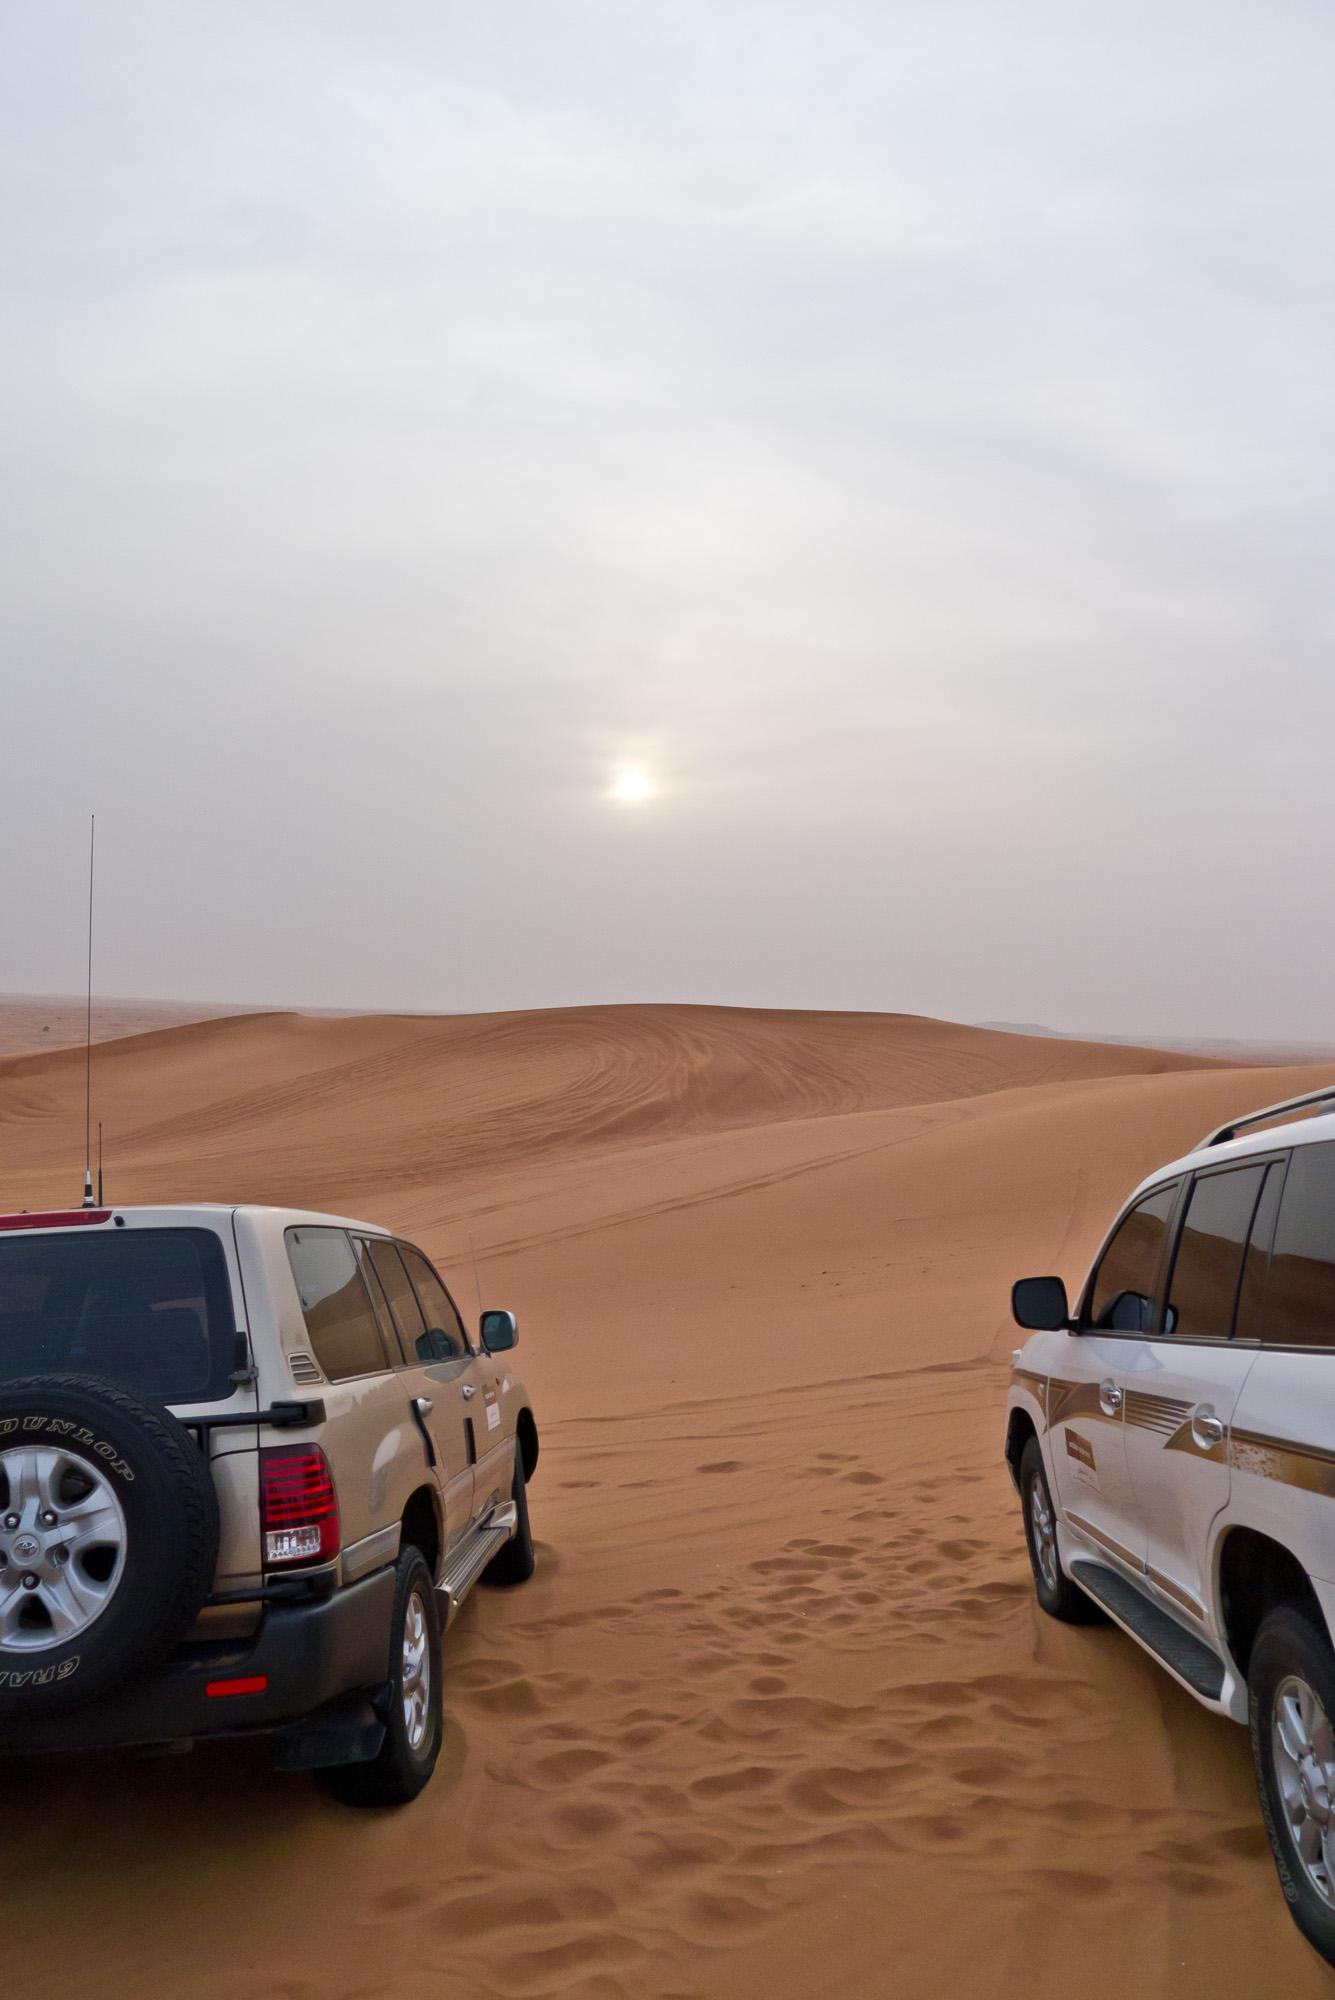 Land Cruisers on the dunes